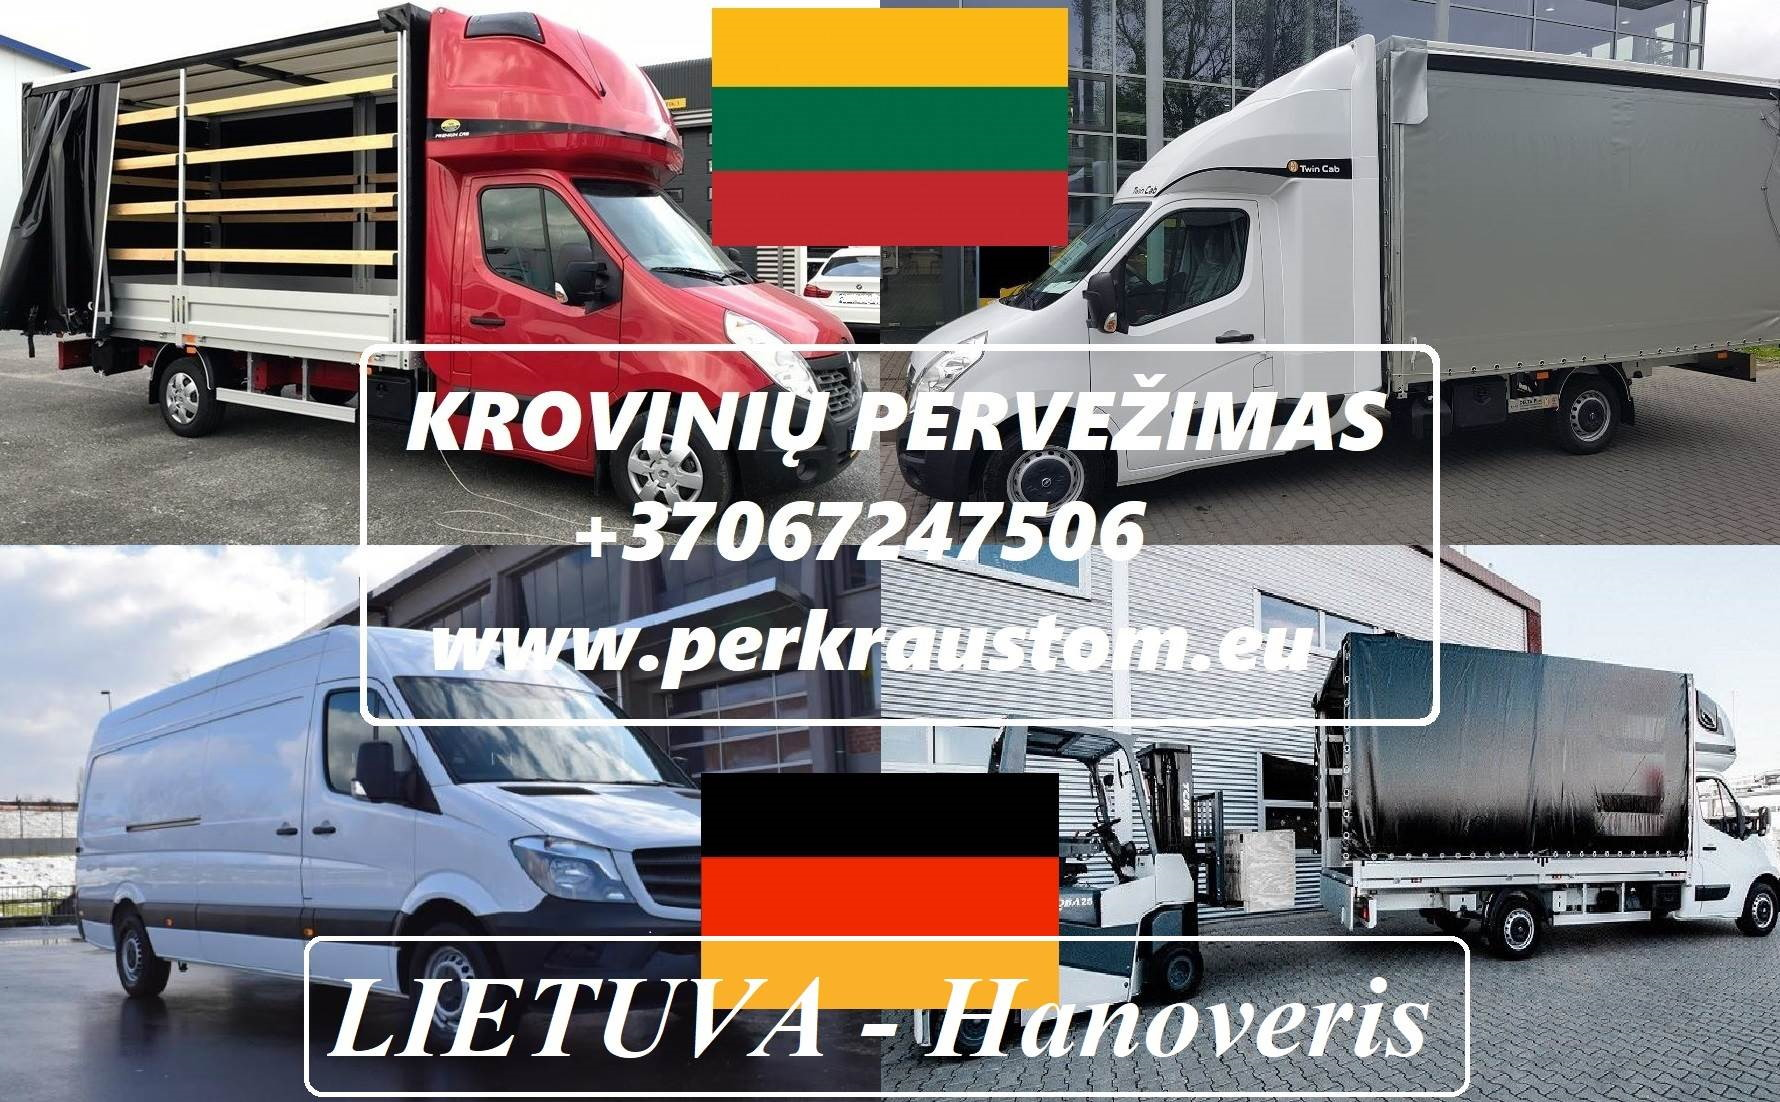 Hanoveris - Lietuva - Hannover !